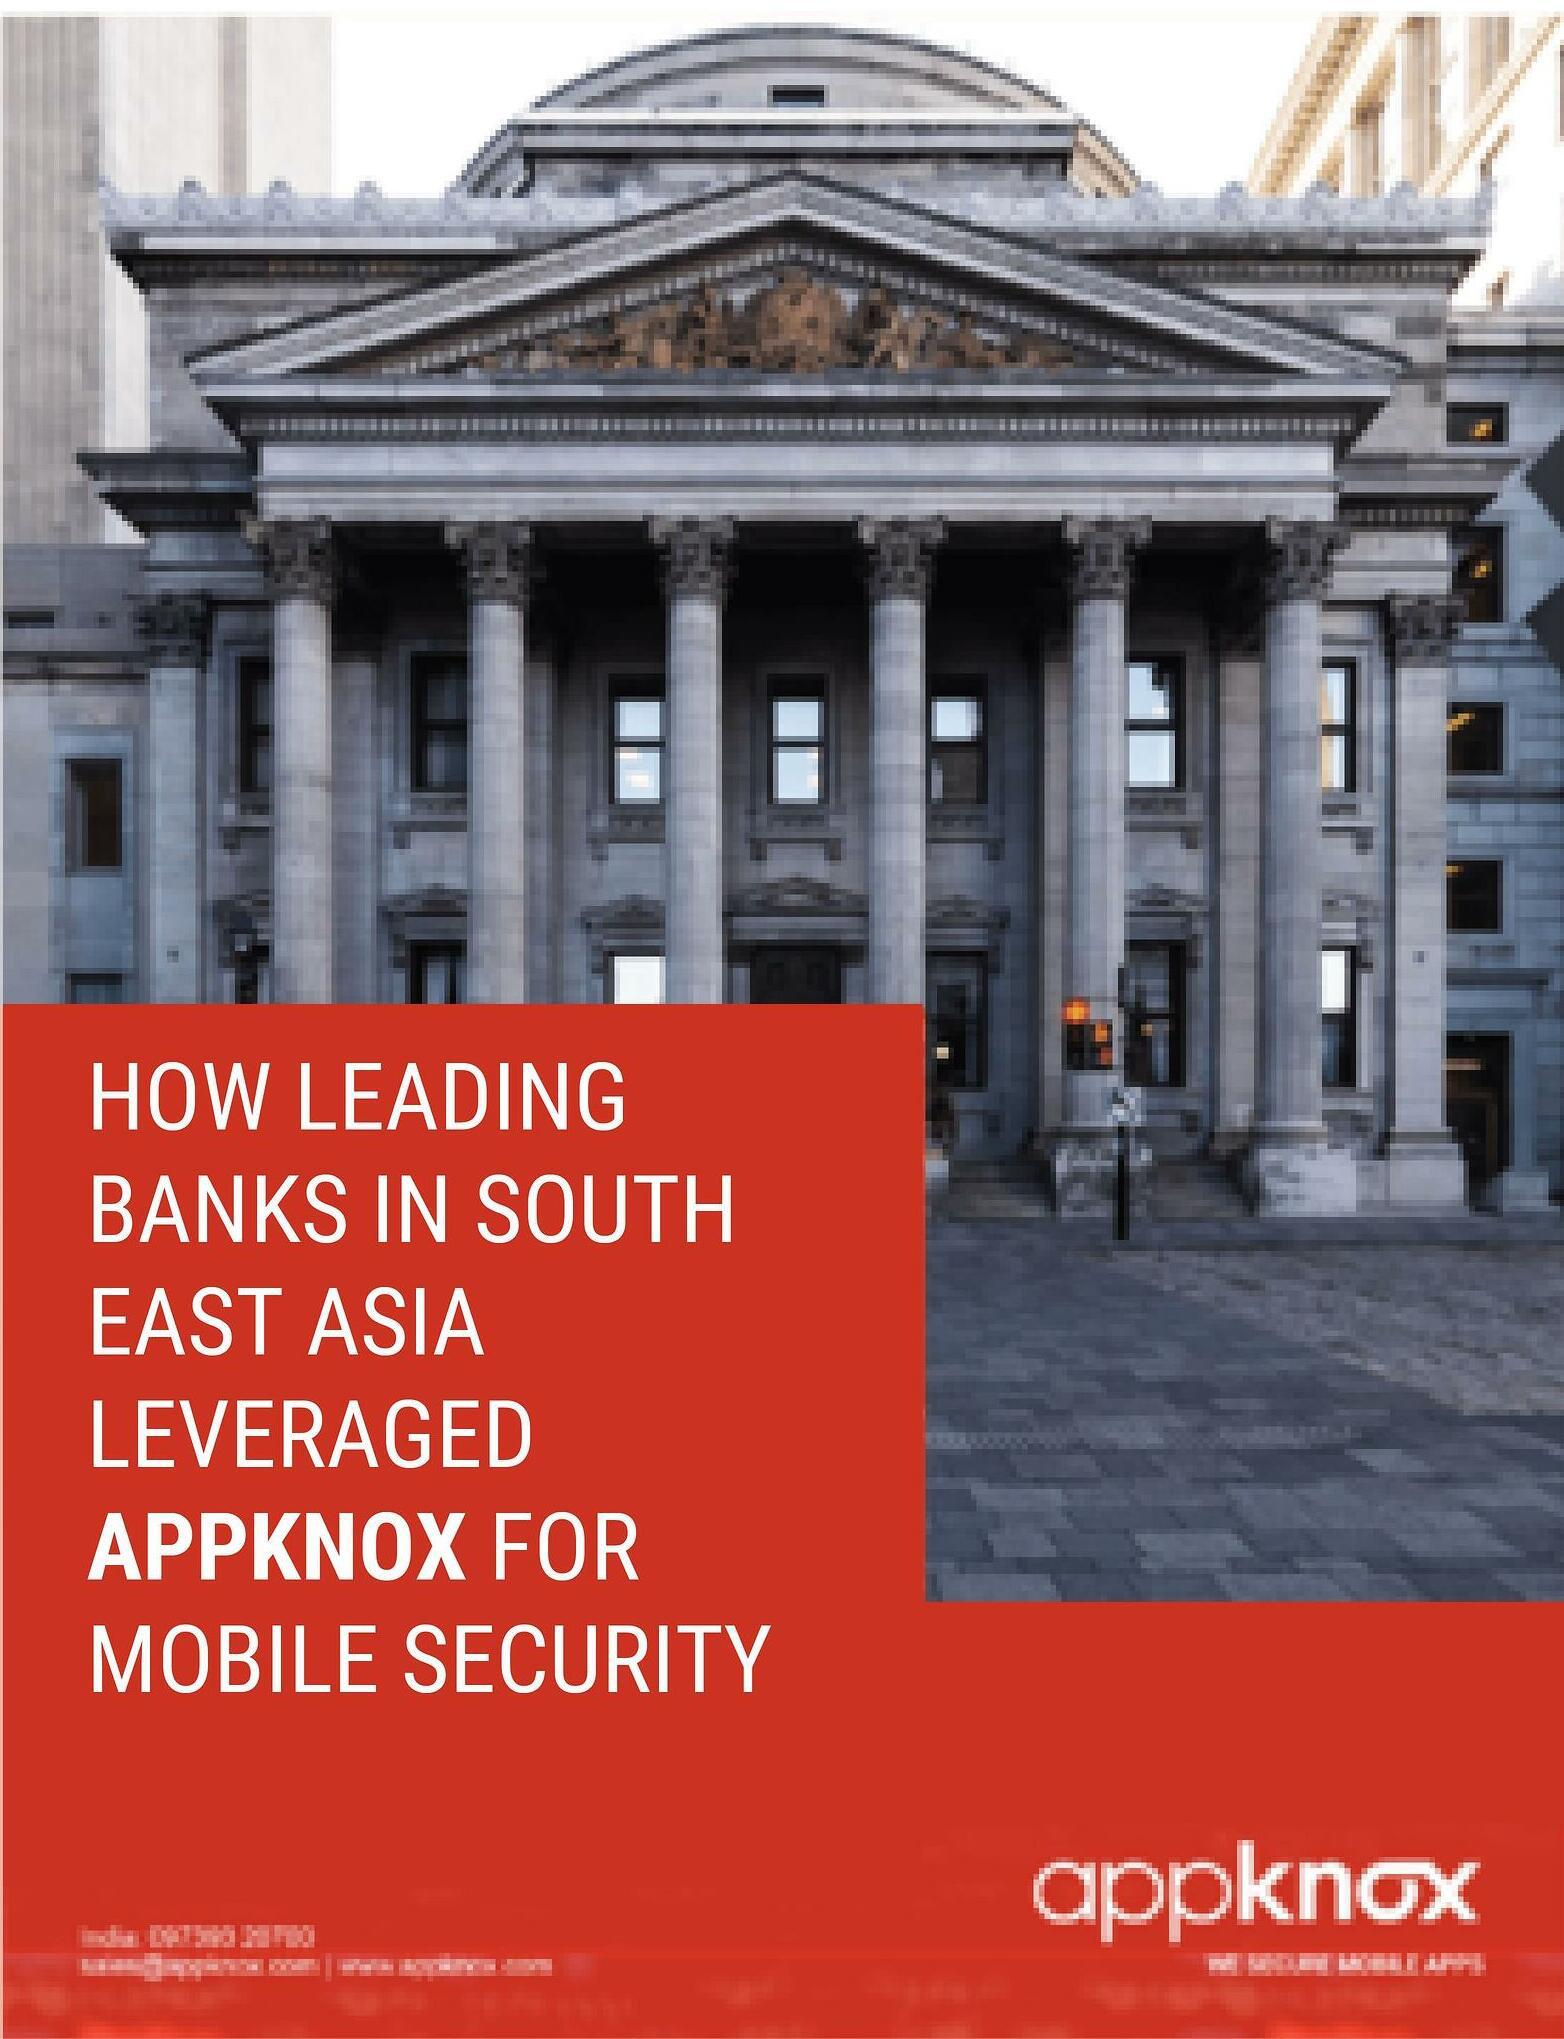 Appknox banking white paper